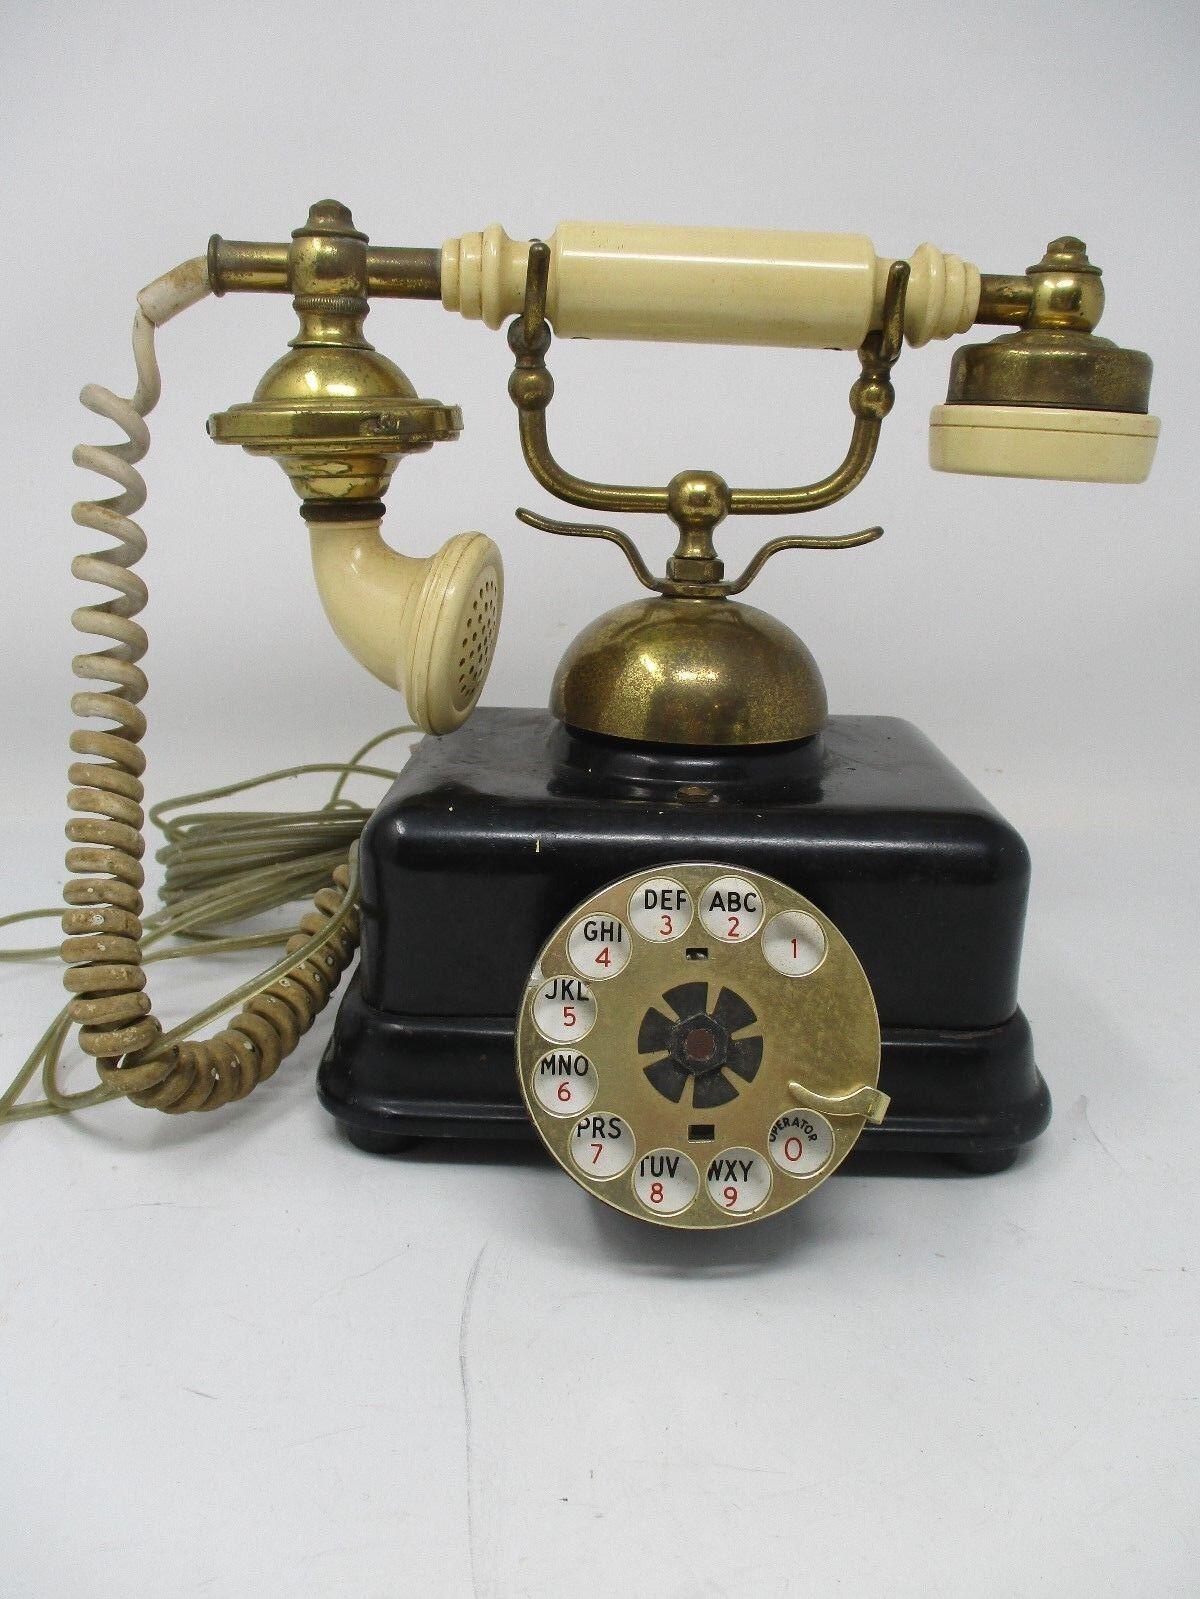 Vintage United States Telephone Company Model US4 Rotary Phone